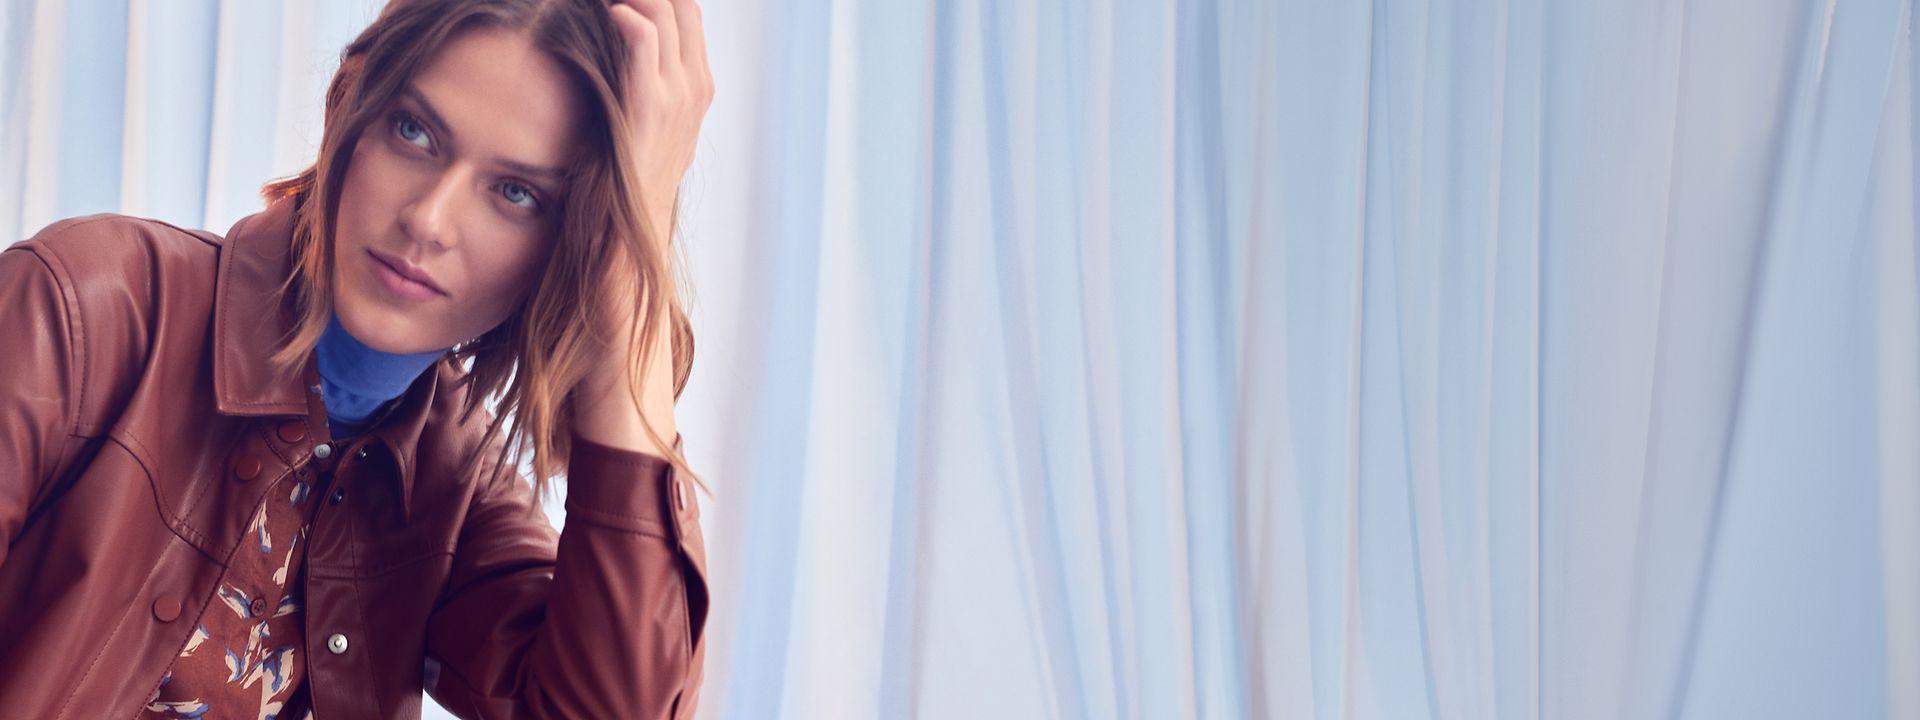 342021 - women - startpage - main banner - Brown Shades - IMG